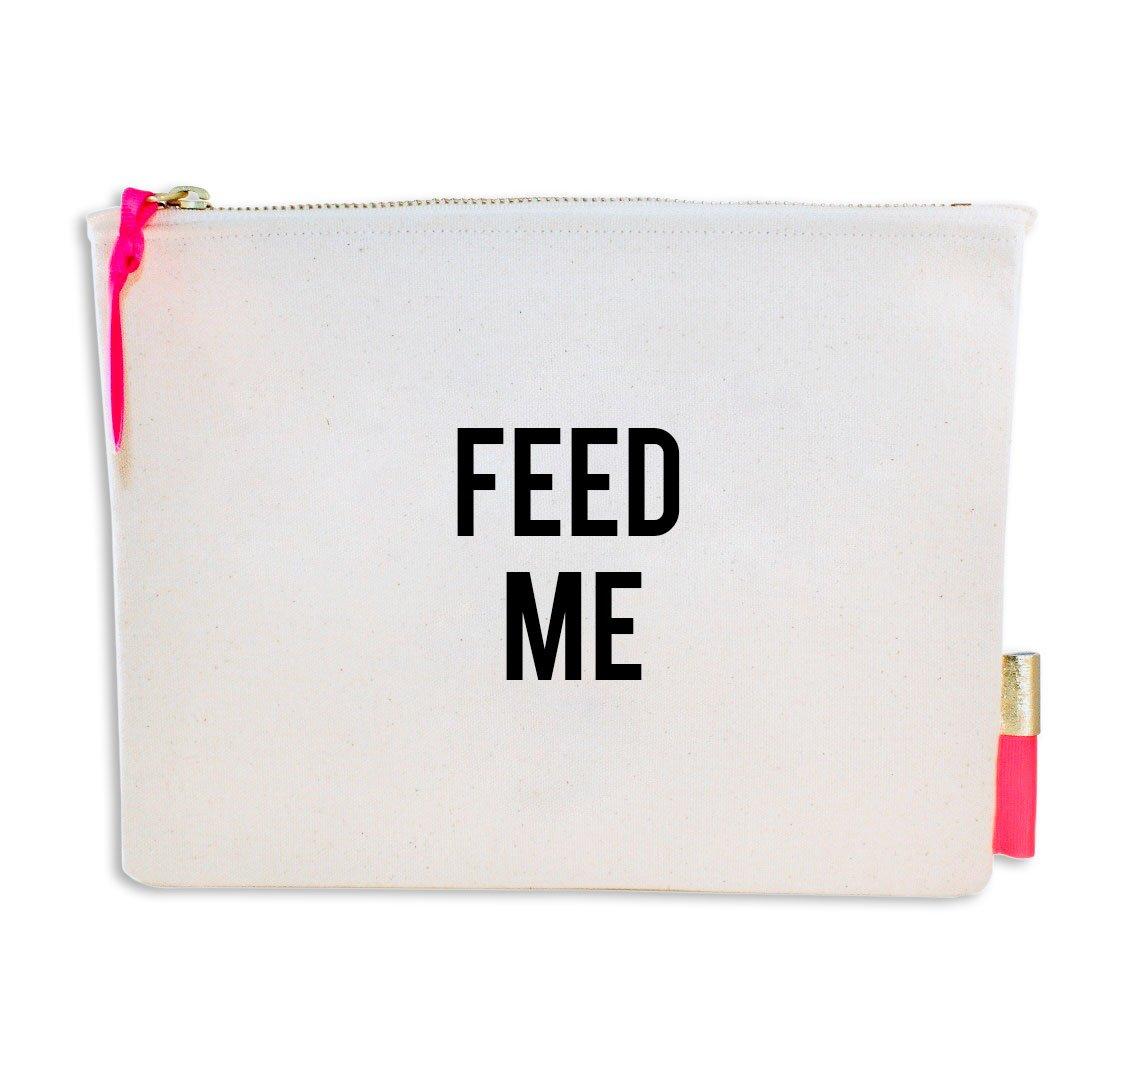 Image of PIPI CUCU CANVAS CLUTCH- FEED ME